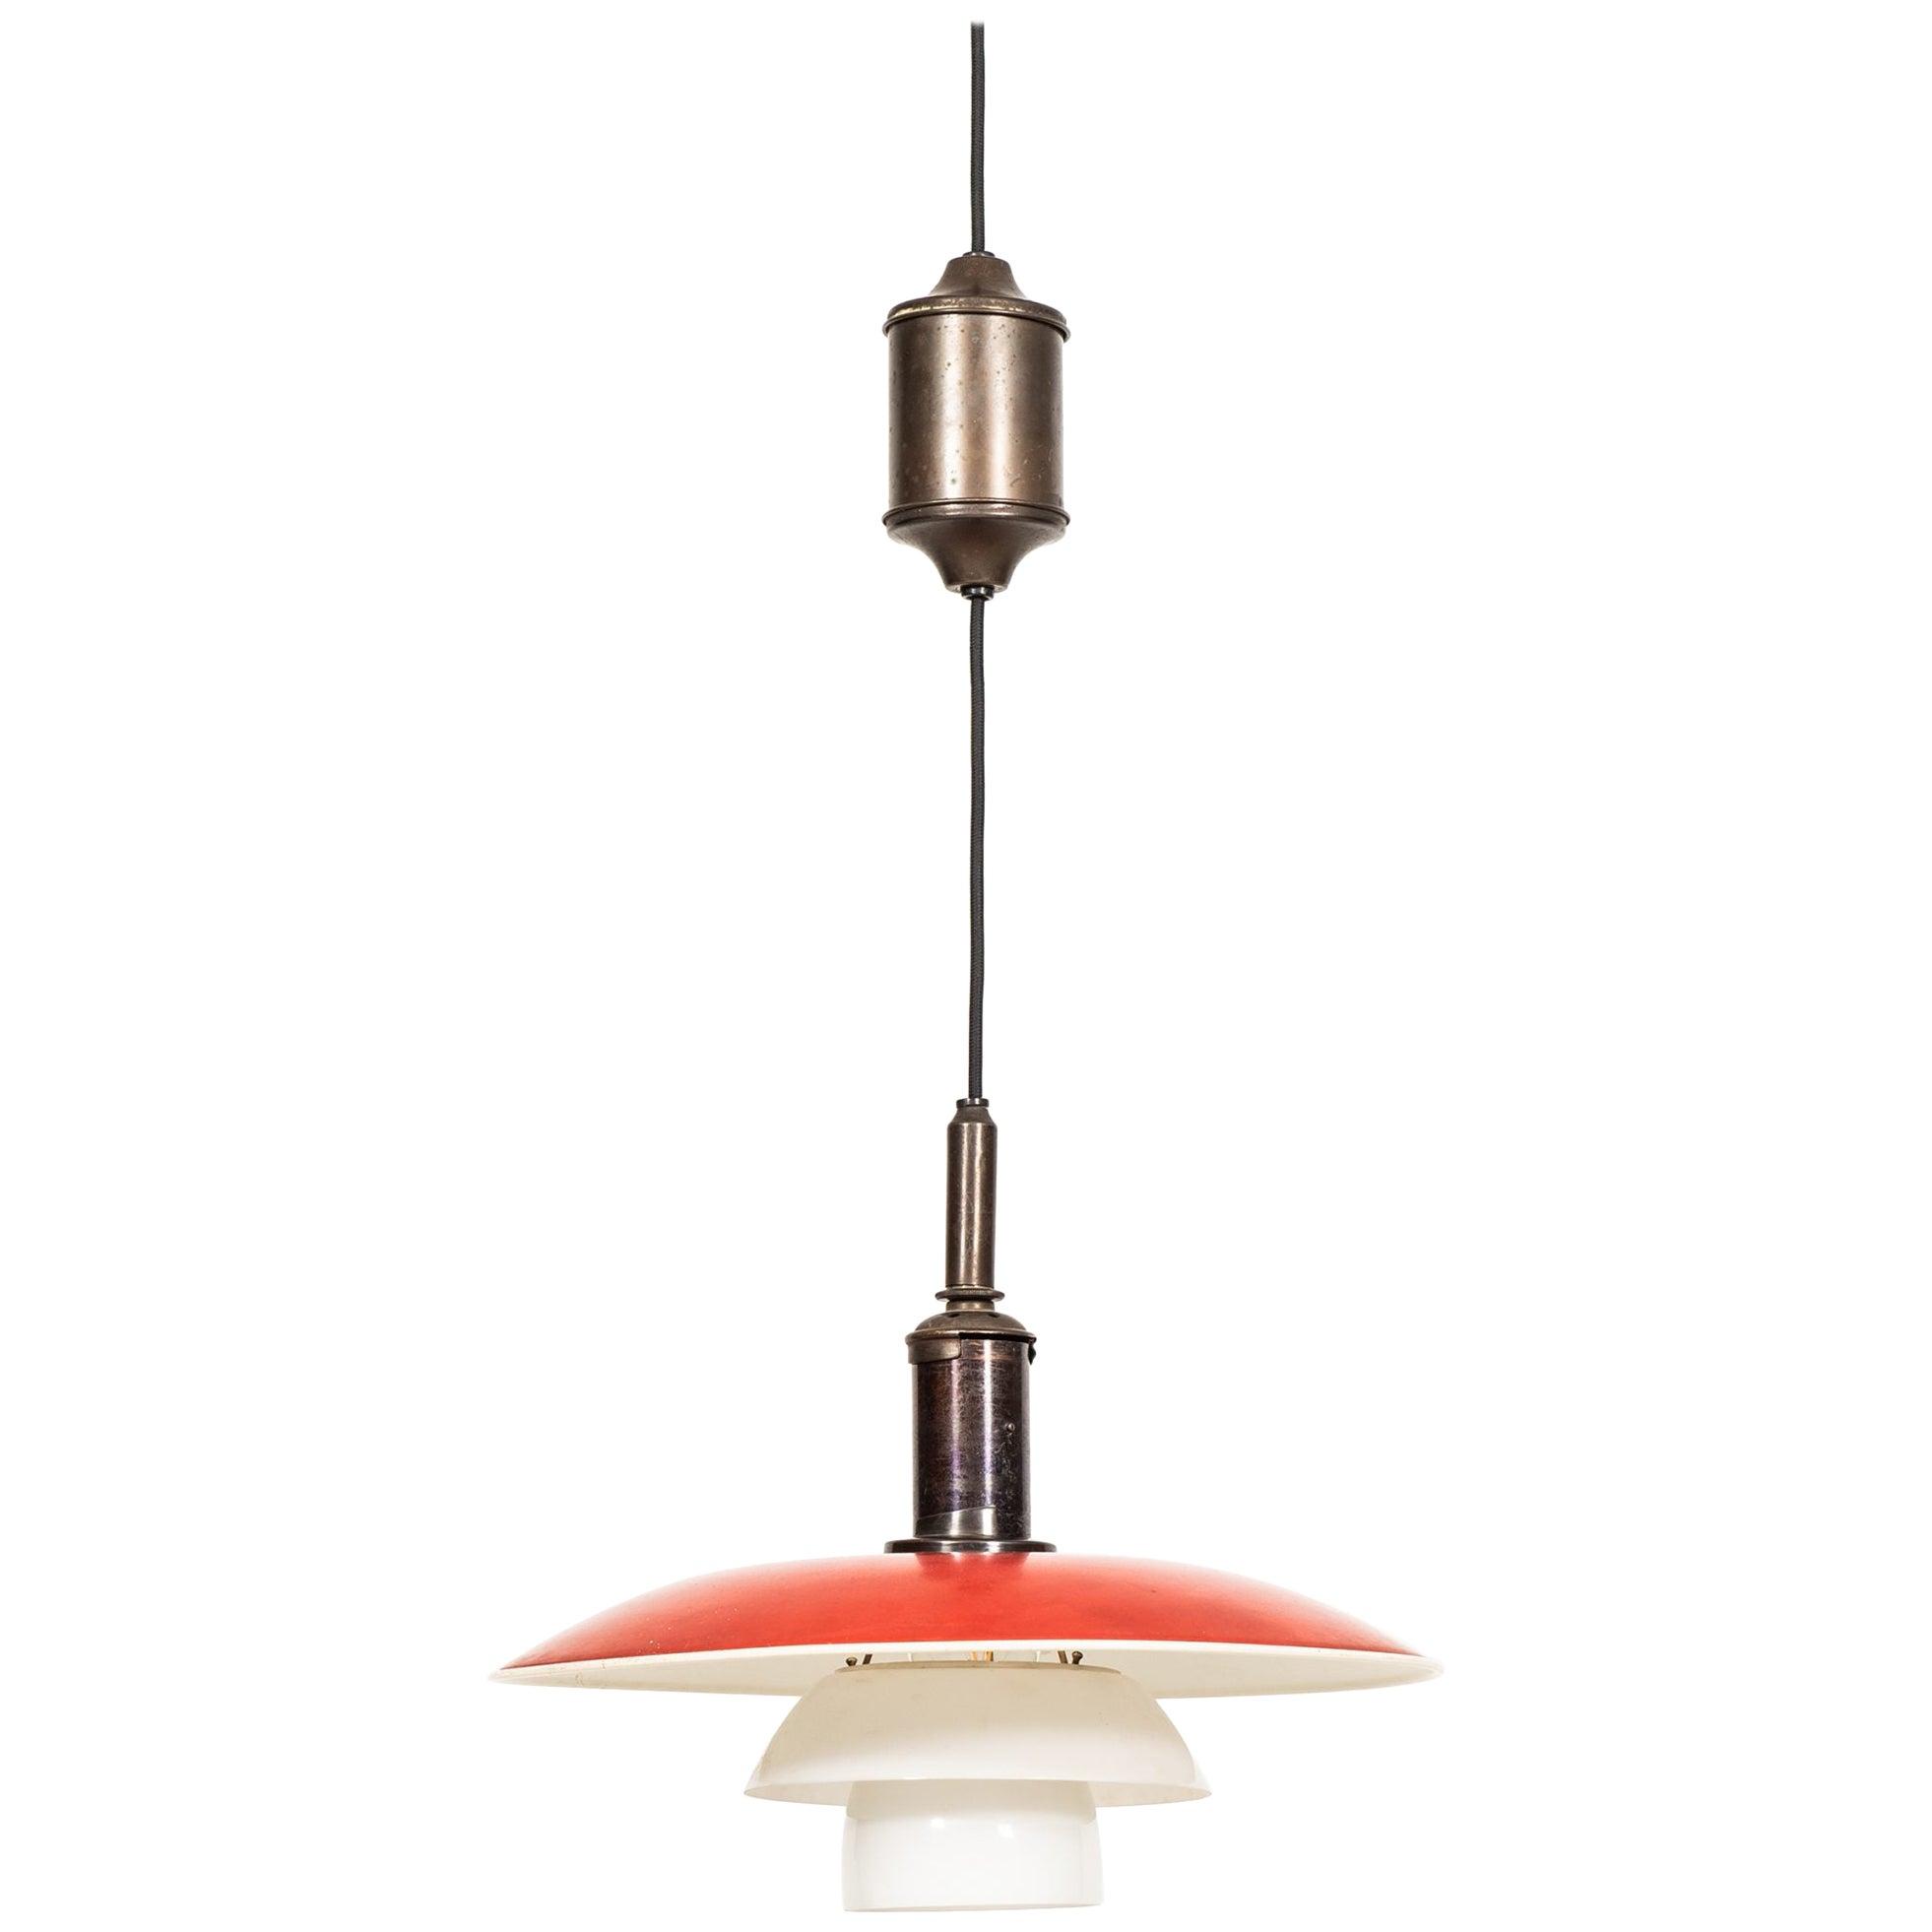 Poul Henningsen Ceiling Lamp Produced by Louis Poulsen in Denmark